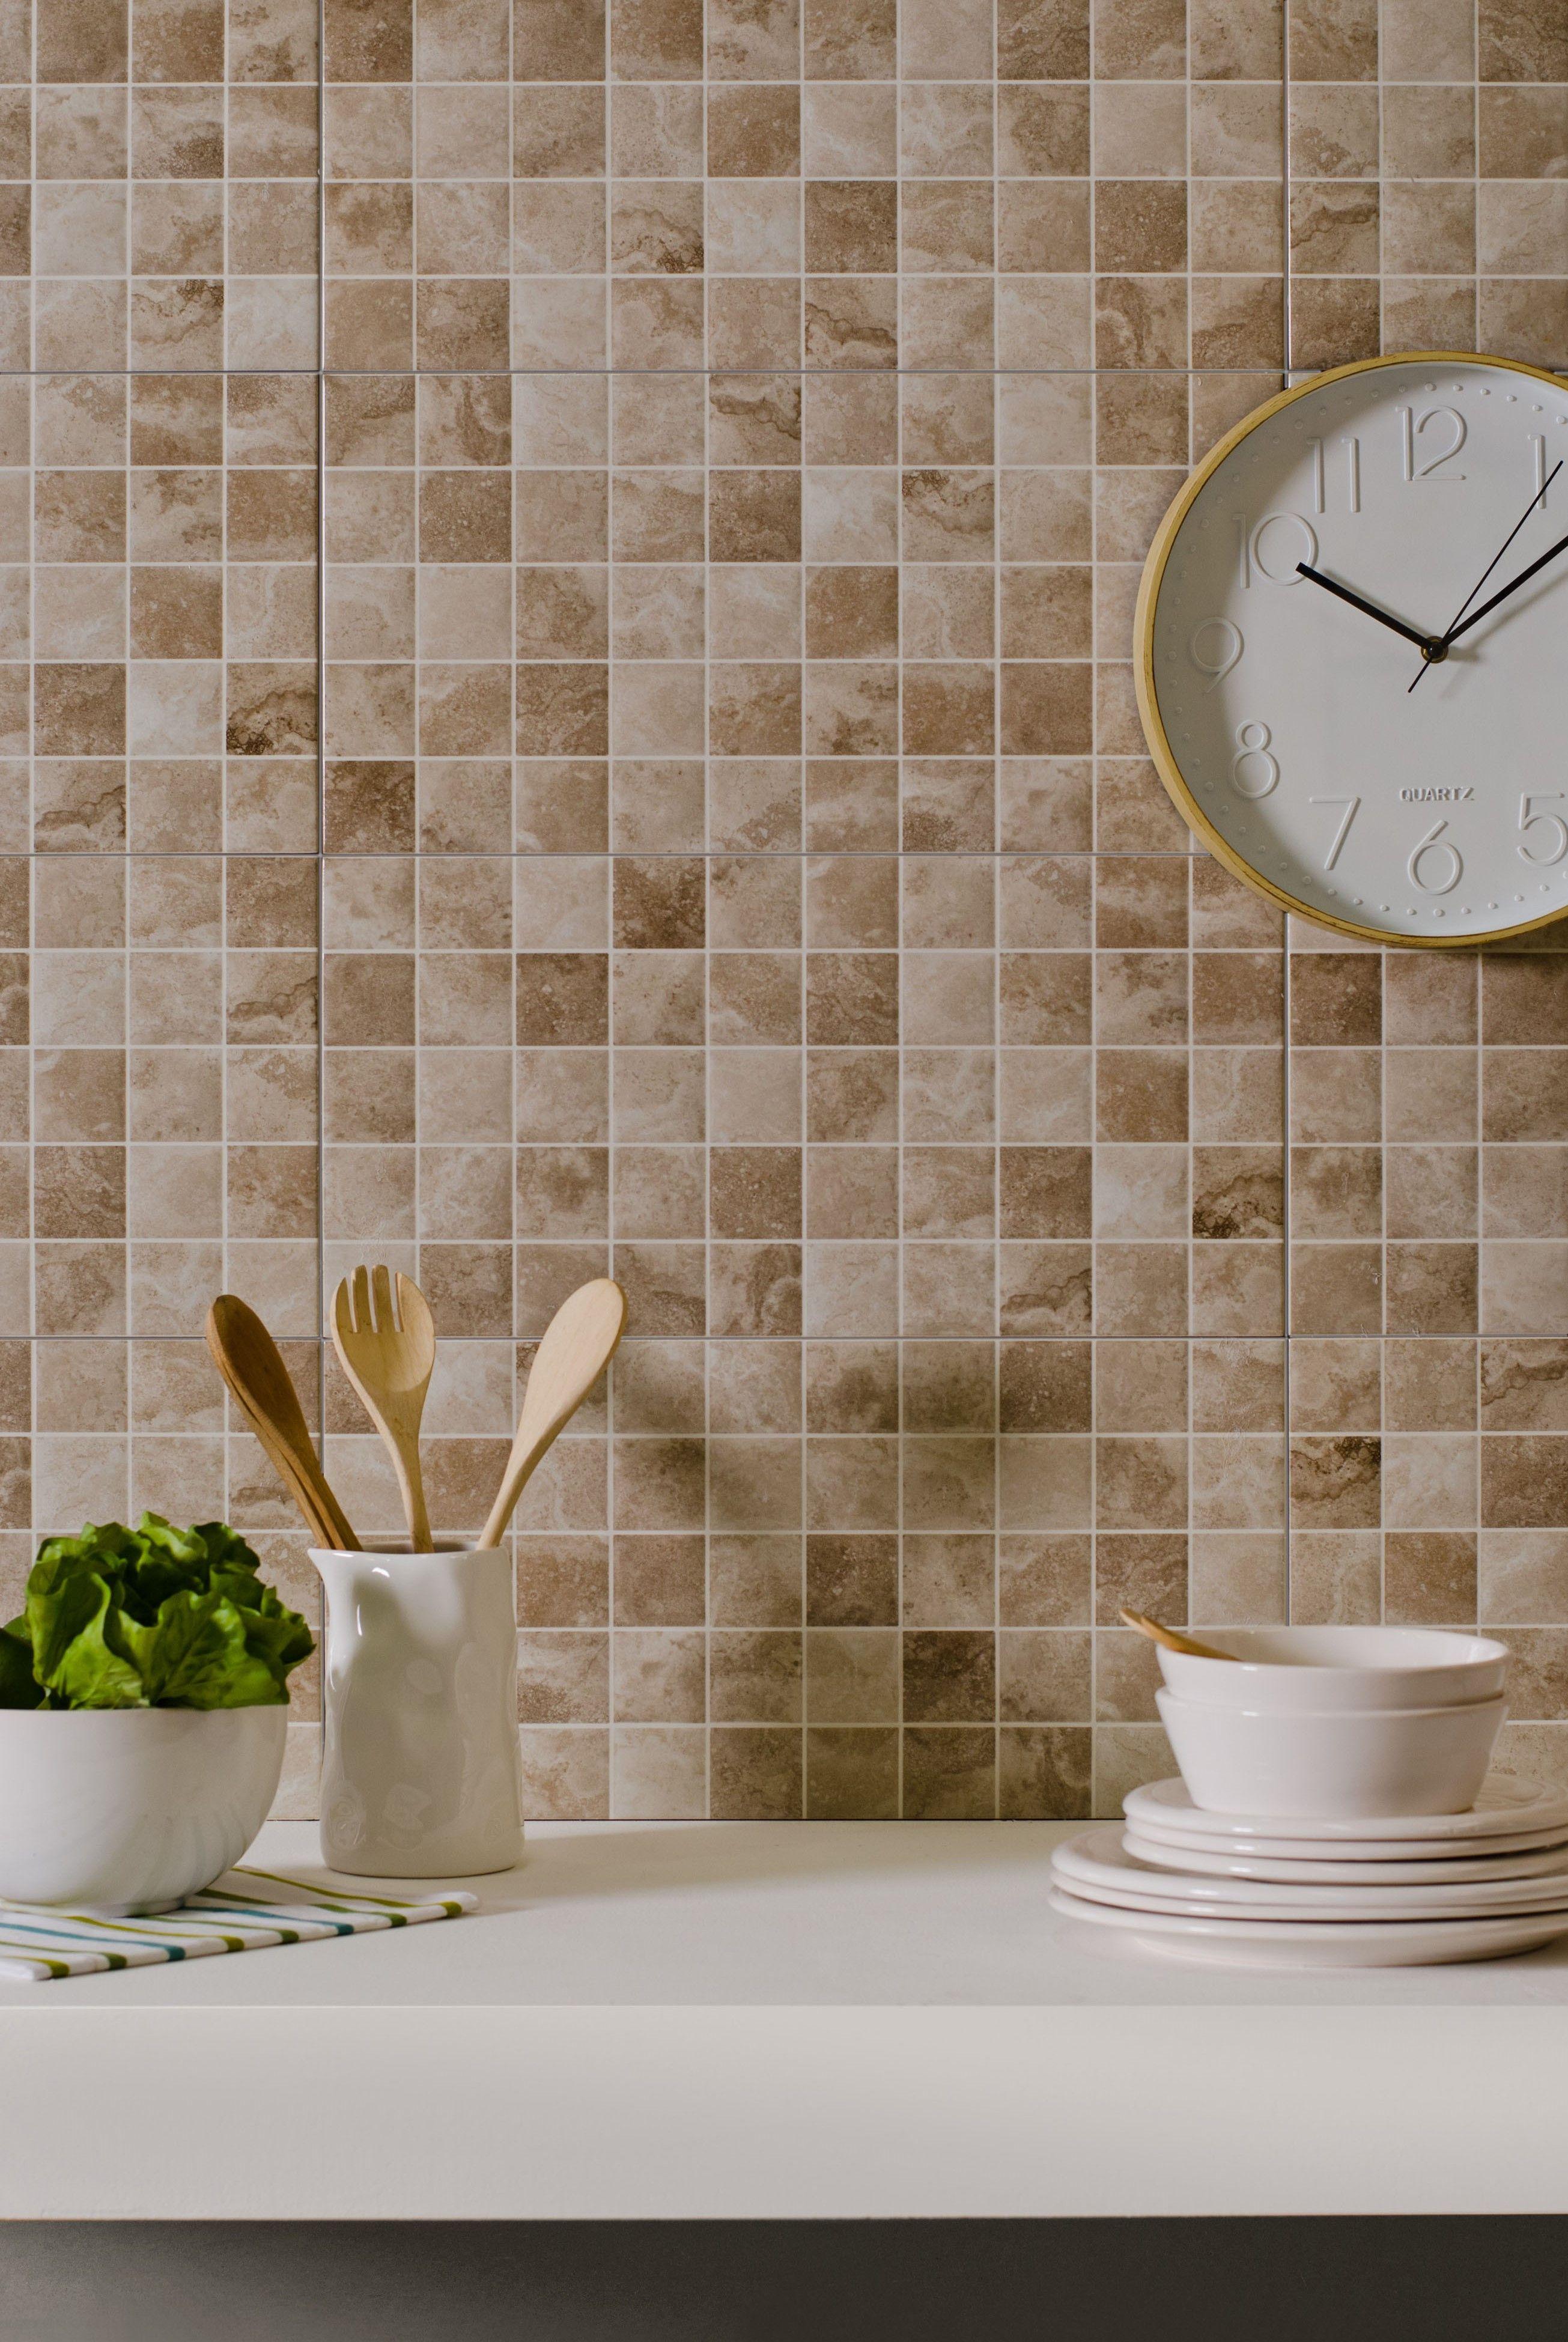 Pared Ceramico Ceramica Revestimiento Cocina Easy